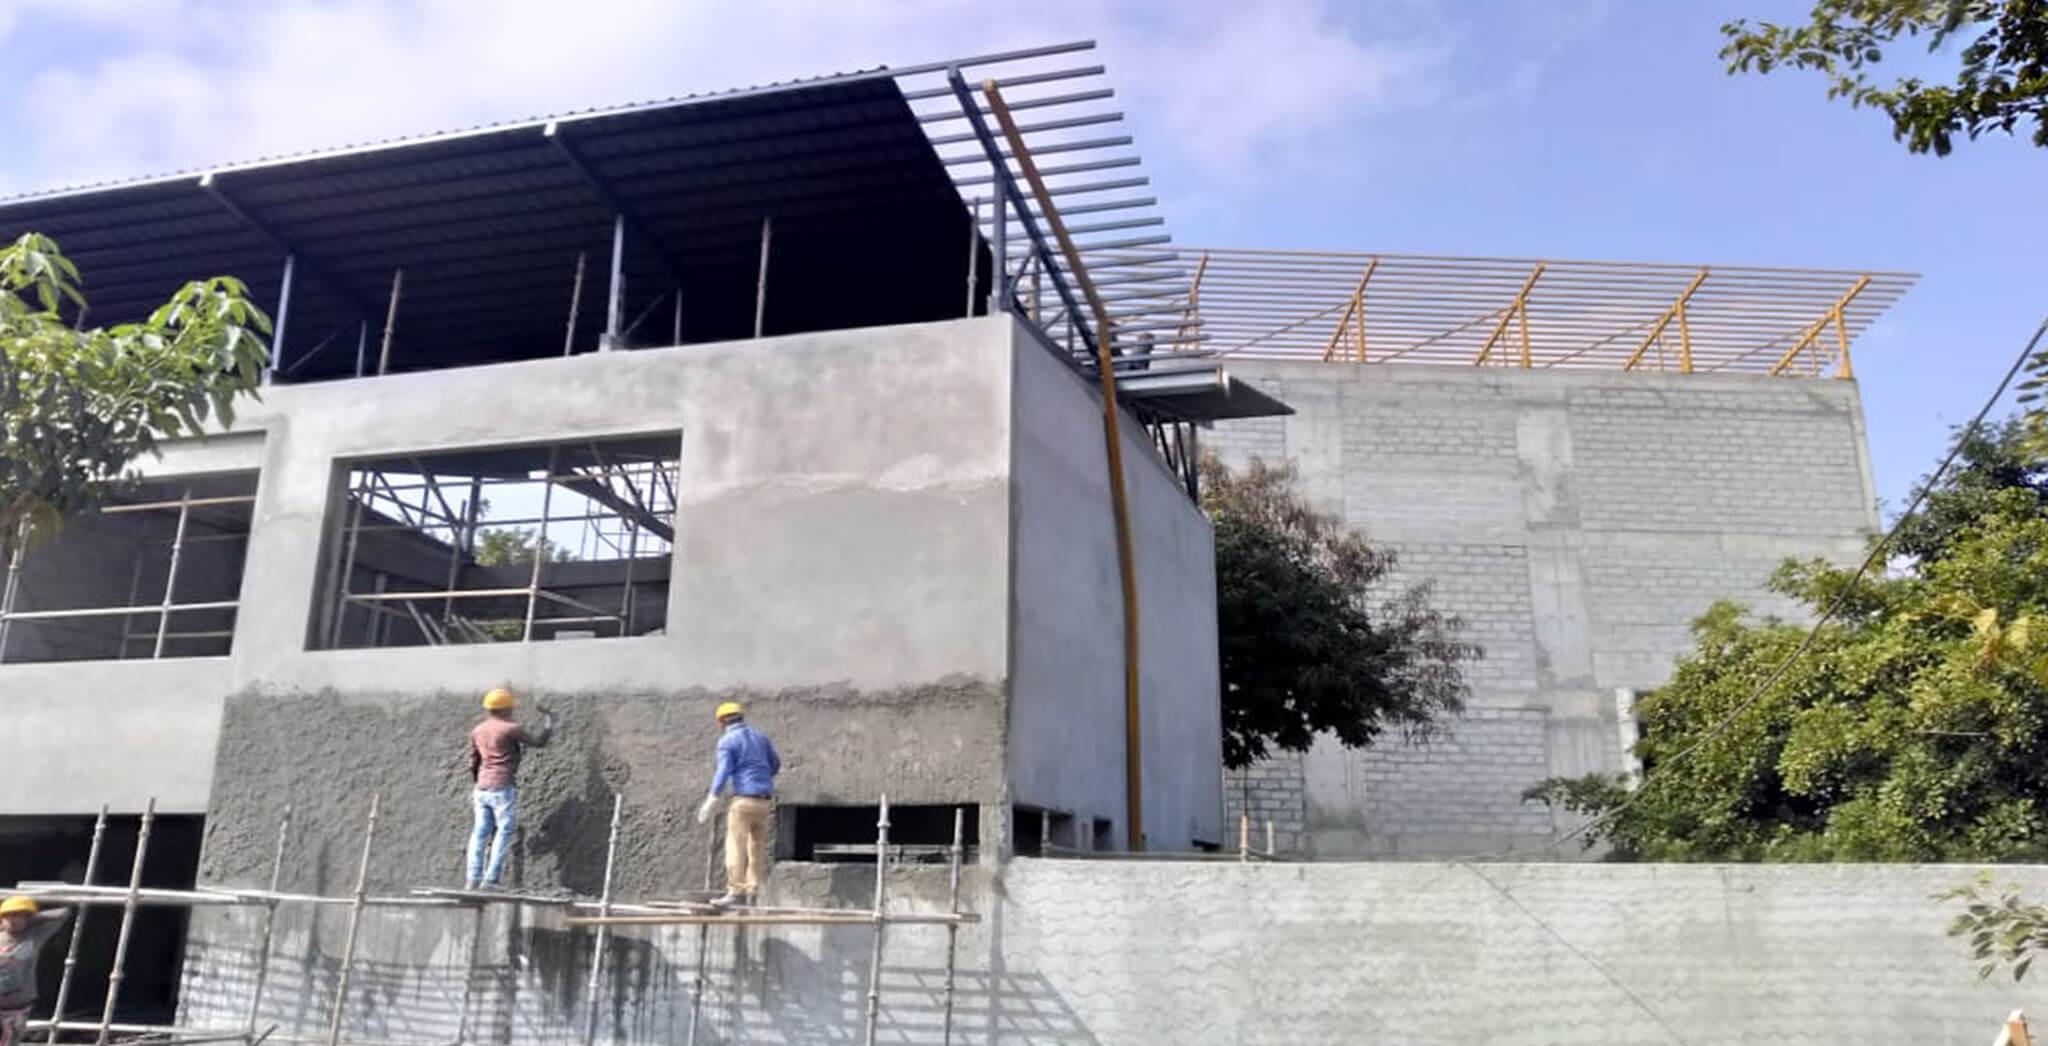 Nov 2018 - Clubhouse—External Plastering work-in-progress